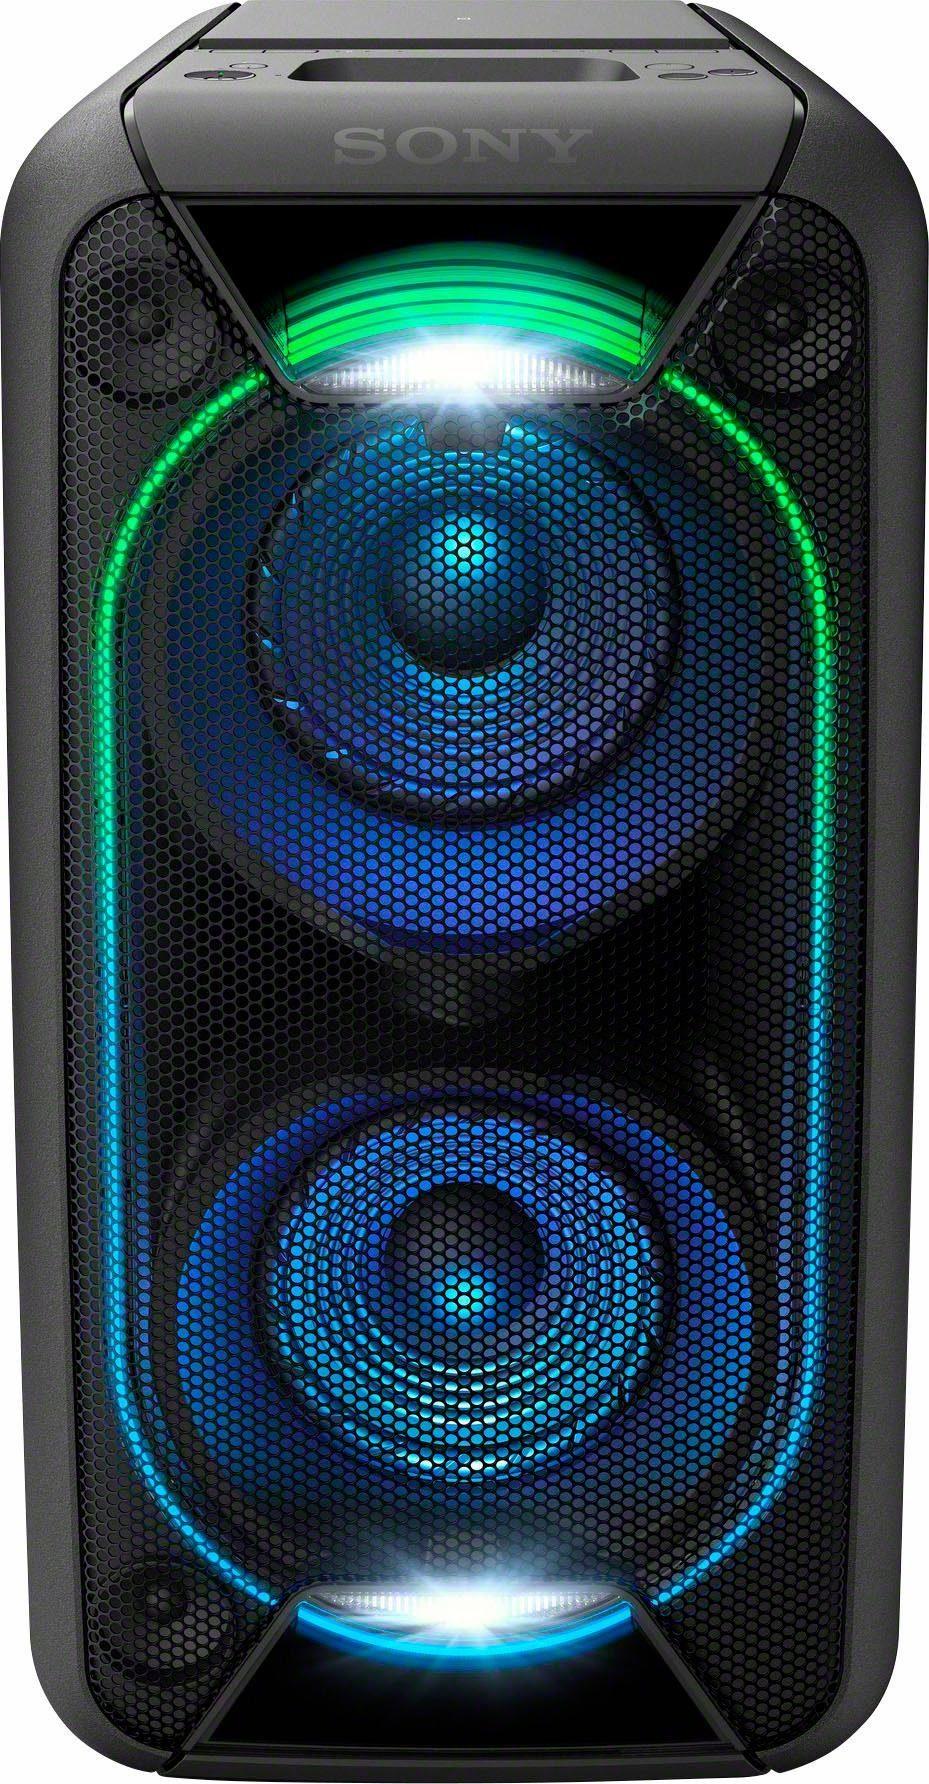 Sony GTK-XB90, Leistungsstarkes One Box Soundsystem (Extra Bass, Bluetooth, NFC, USB, Lichteffekte, 16 Stunden Akkulaufzeit)